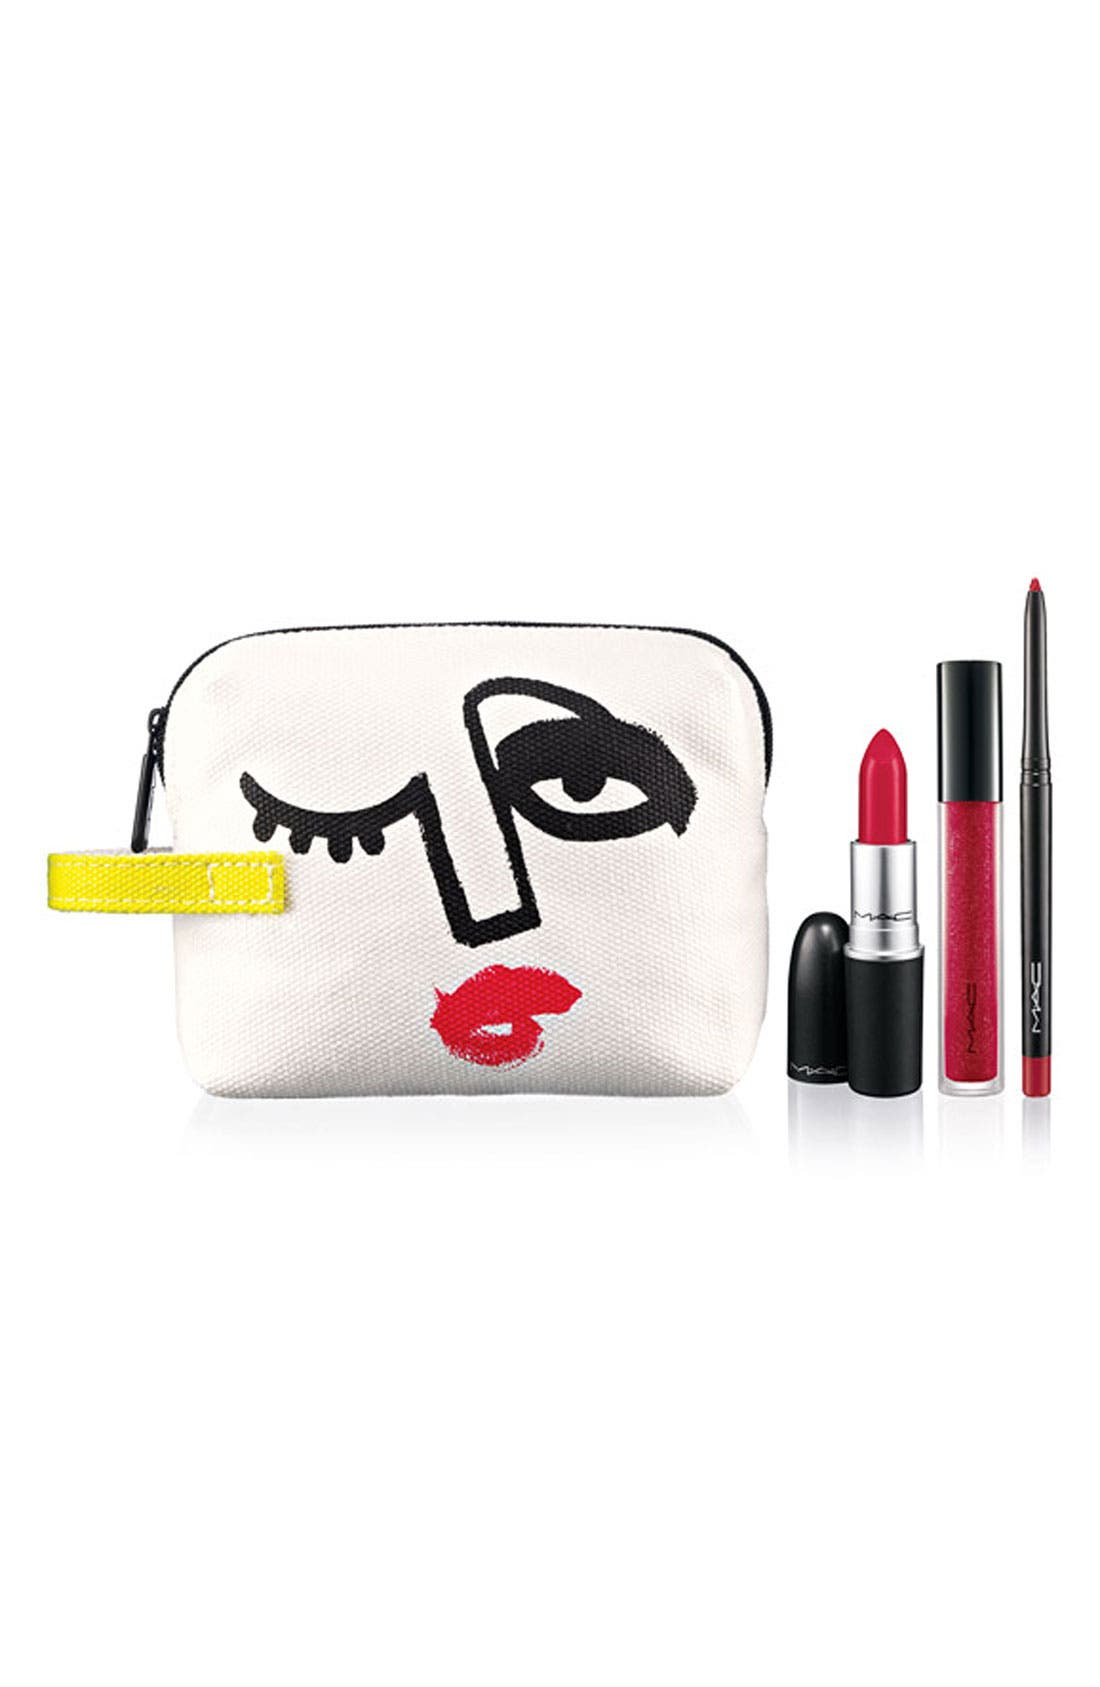 M·A·C 'Illustrated - Red x3' Lip Color & Bag by Julie Verhoeven,                         Main,                         color, 000